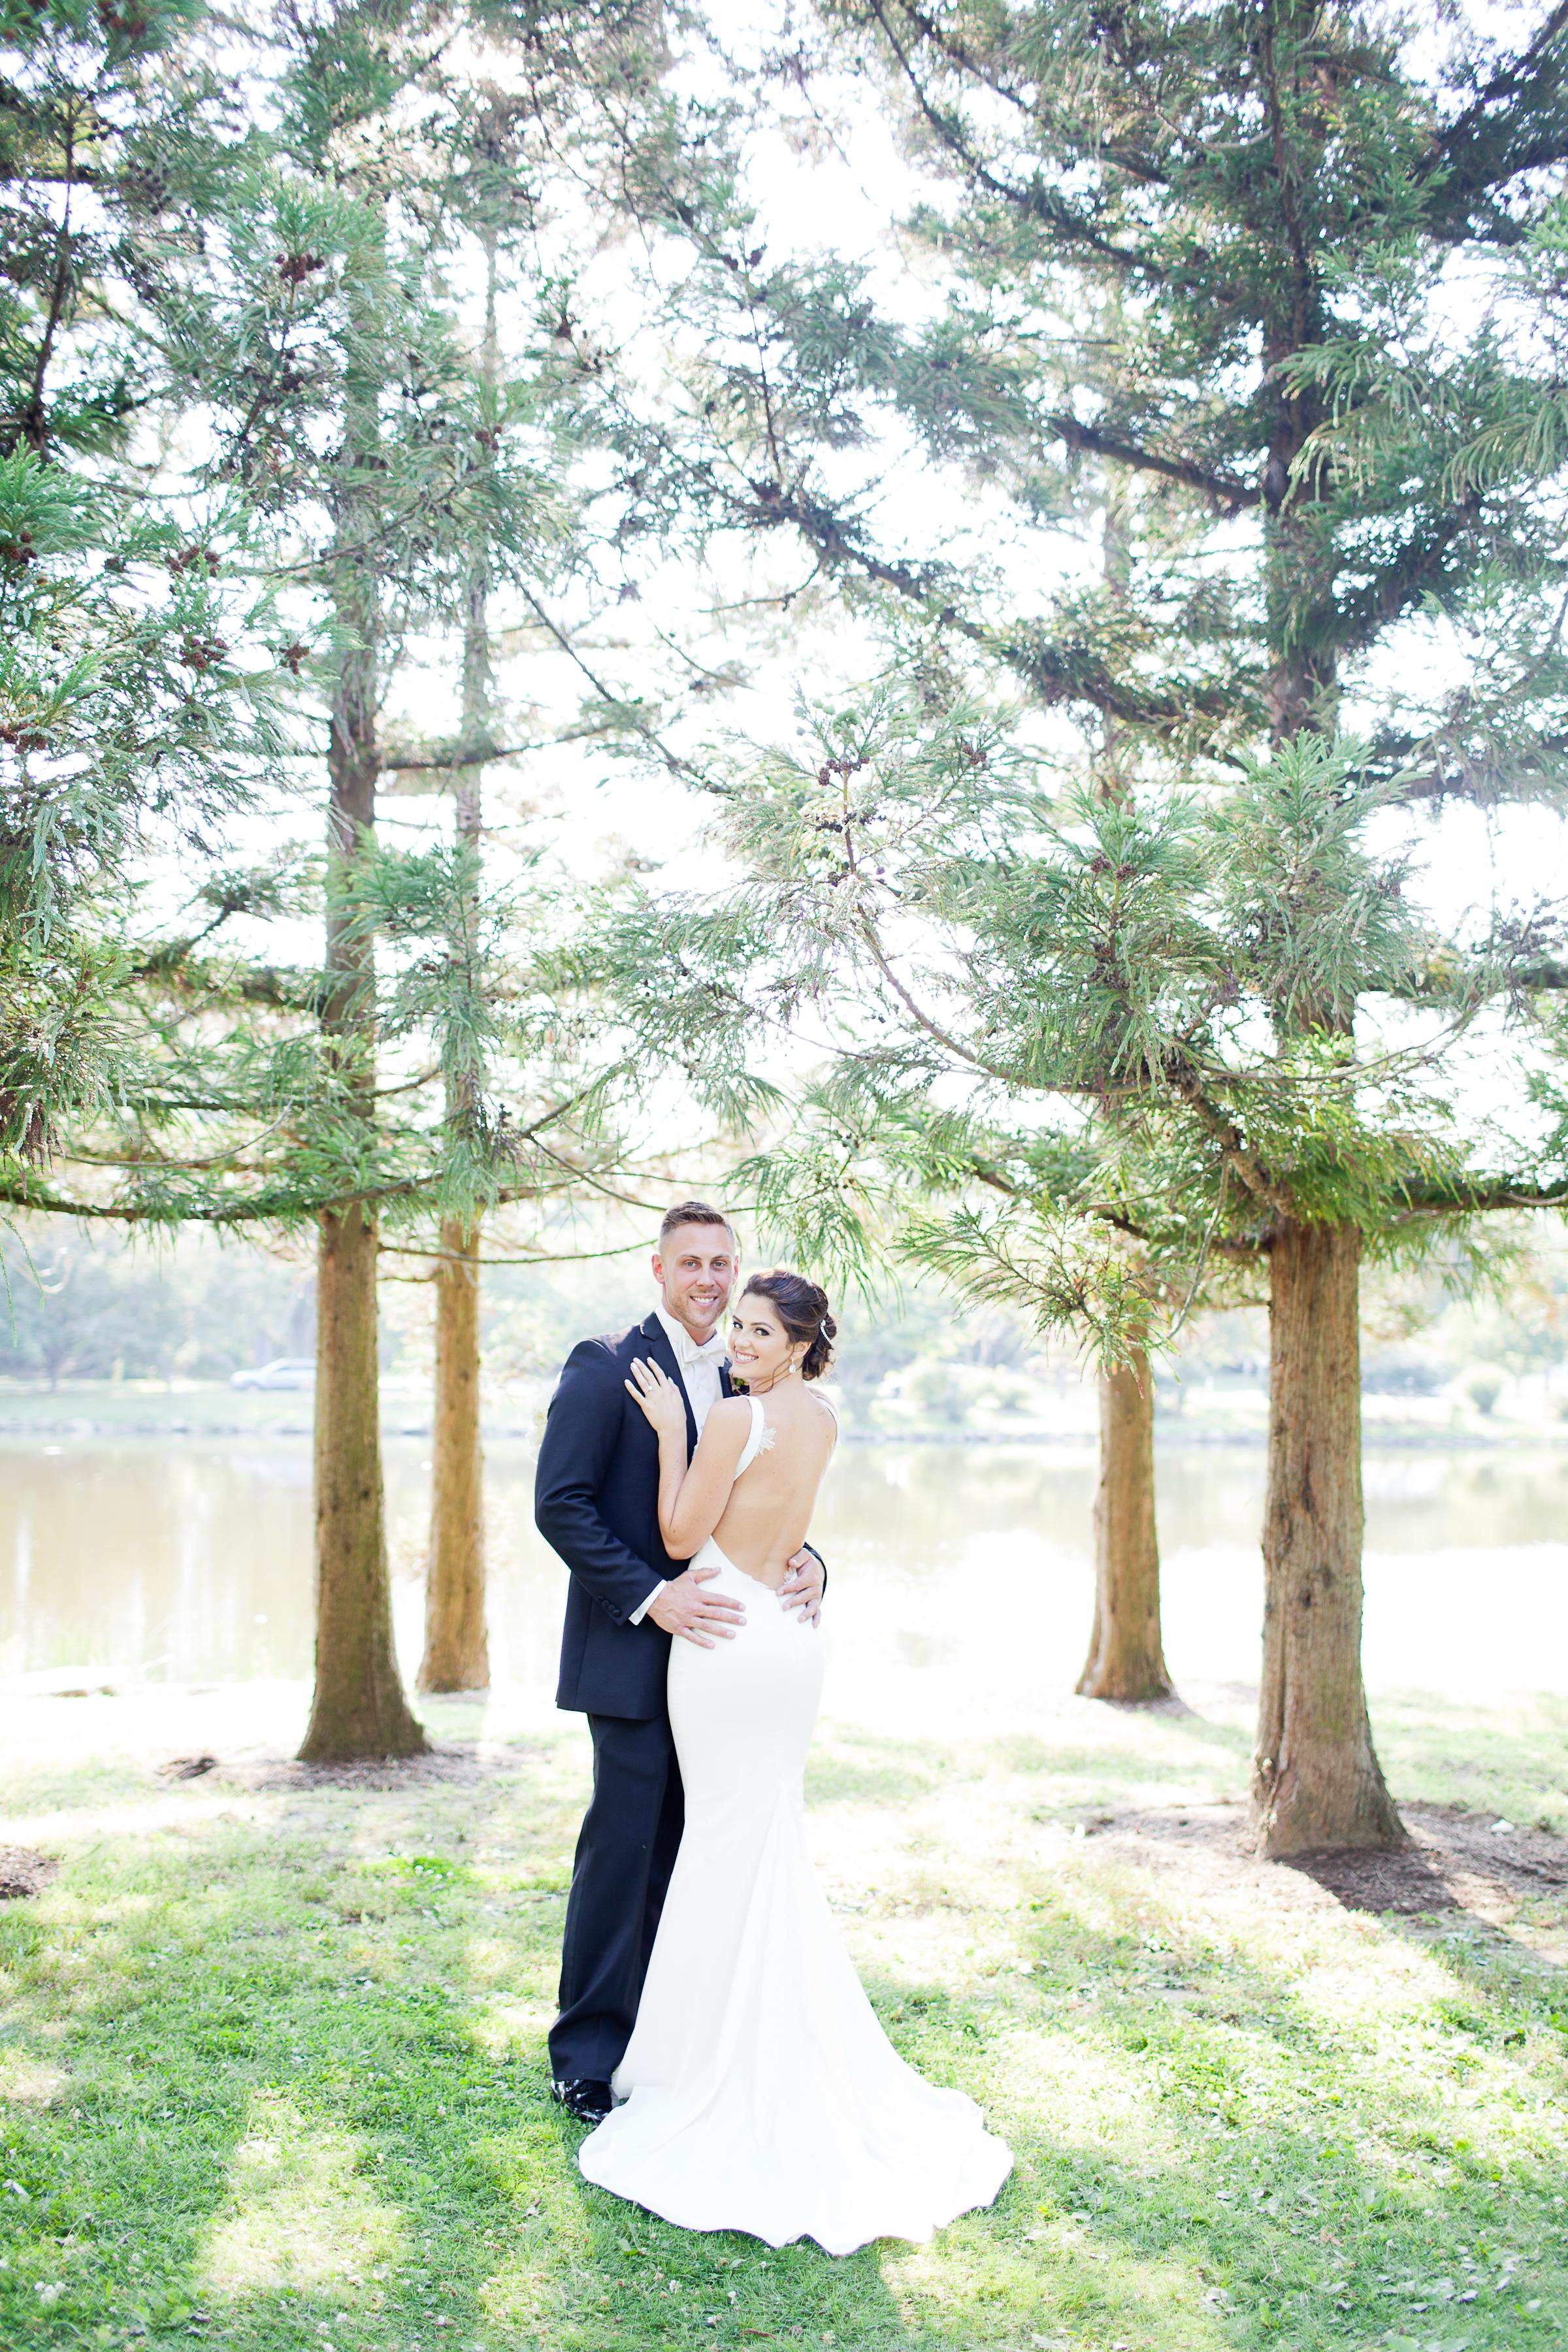 Melissa Kruse Photography - Genna + Anthony The Loading Dock Stamford CT Wedding-386.jpg